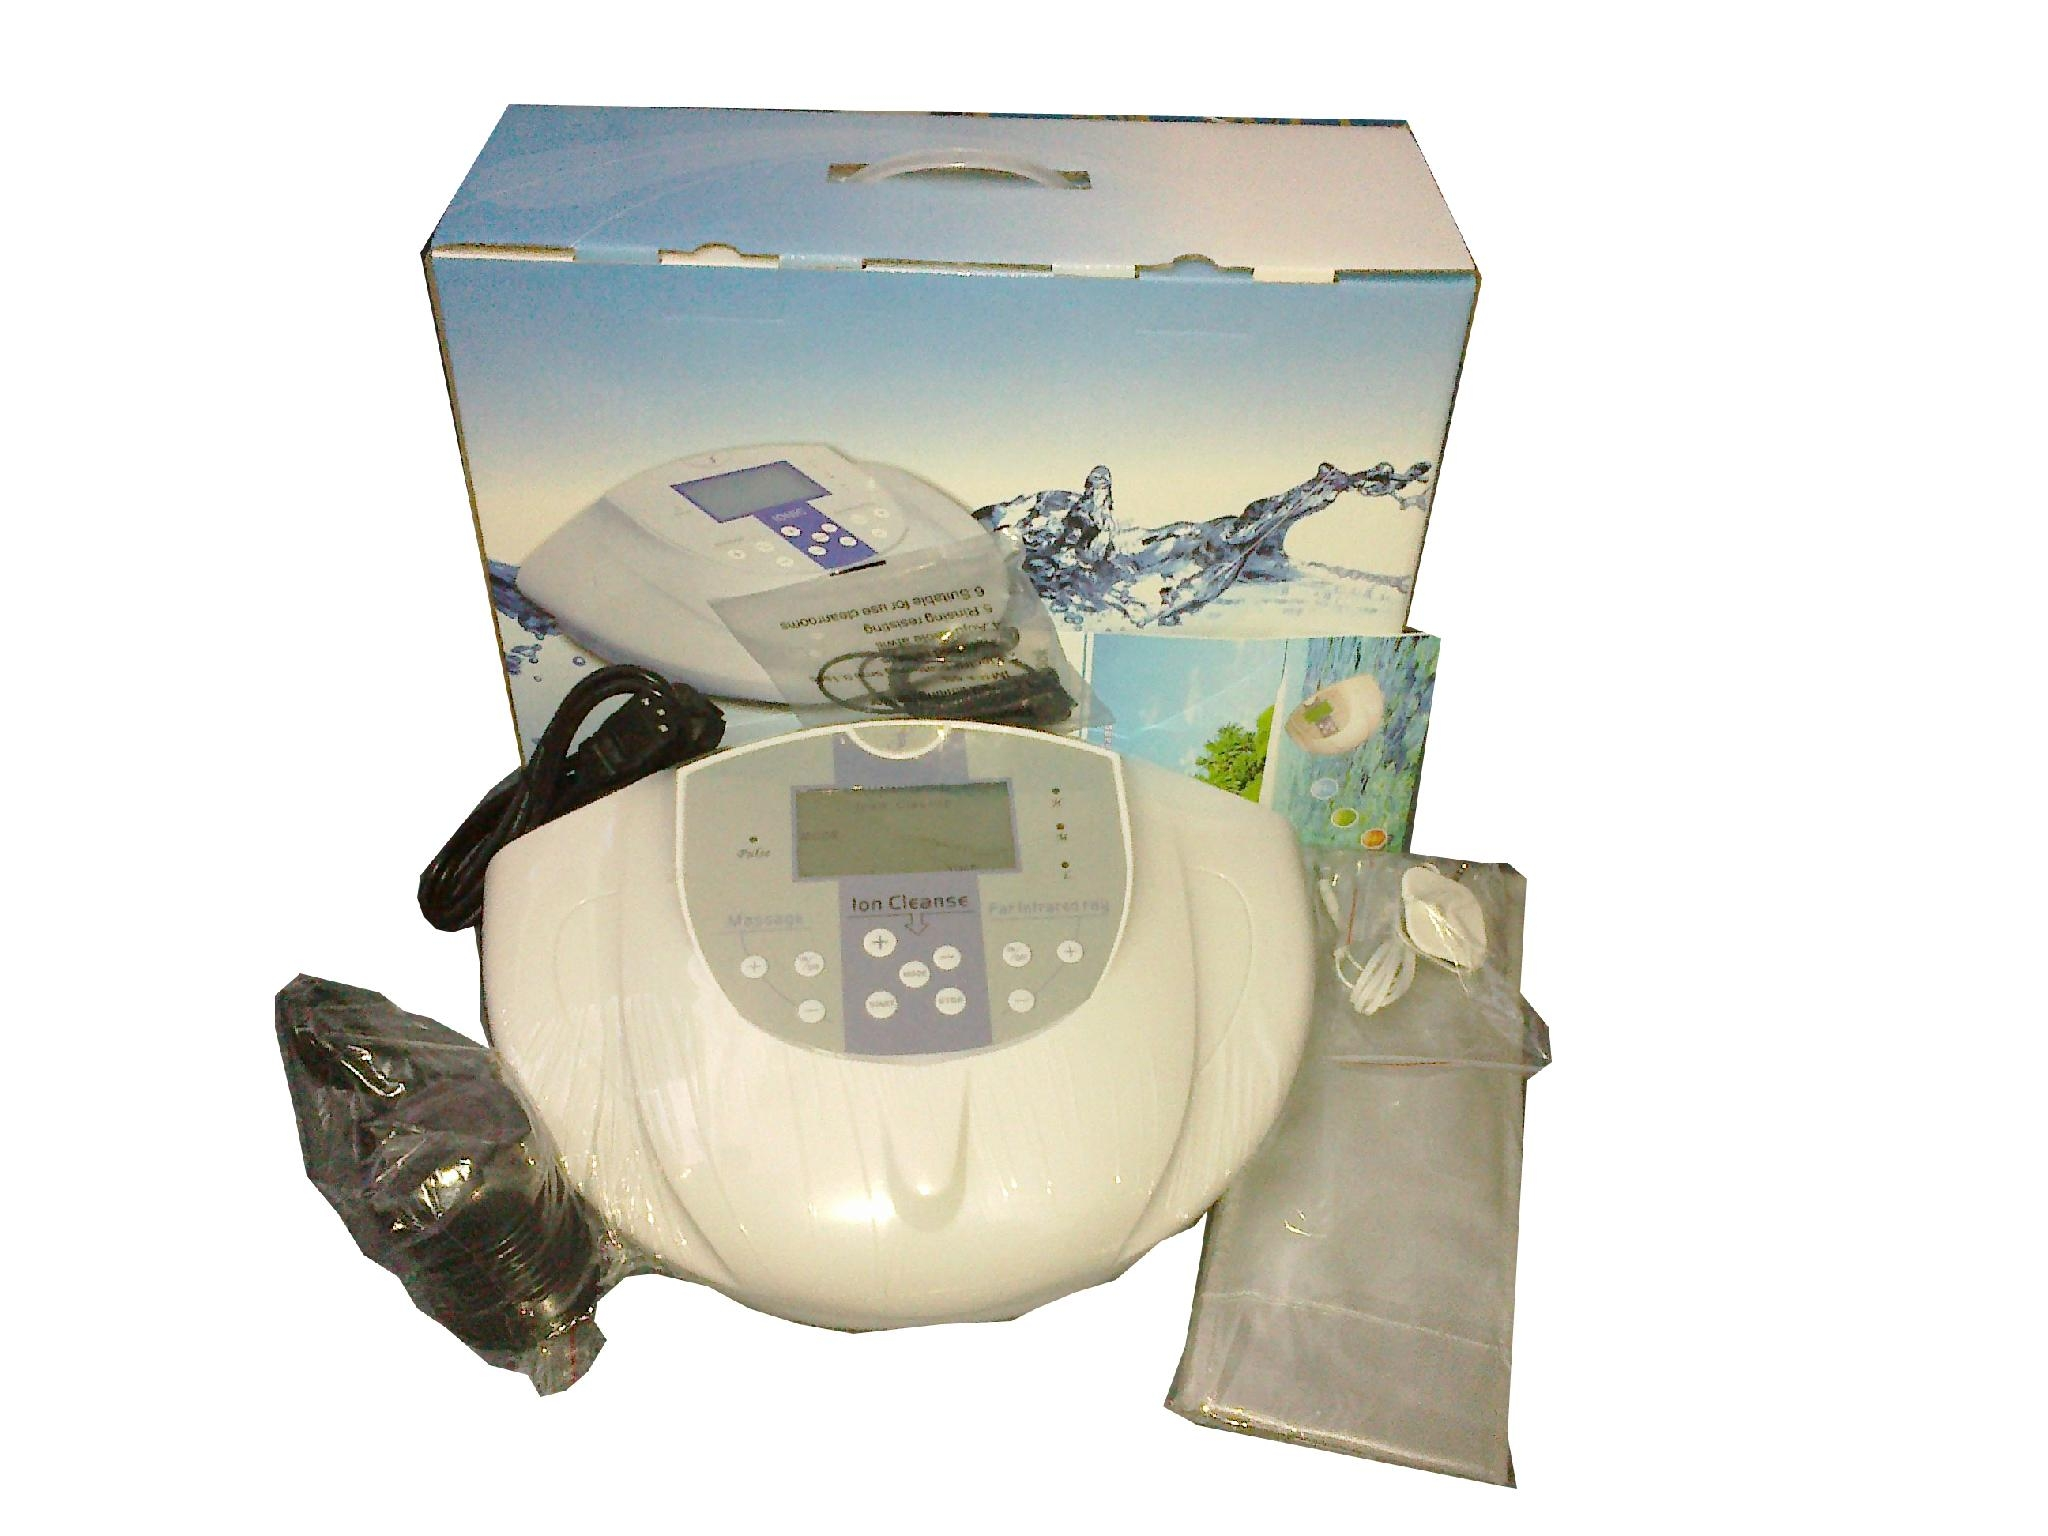 Detox Foot Massager with Massage Pads 4